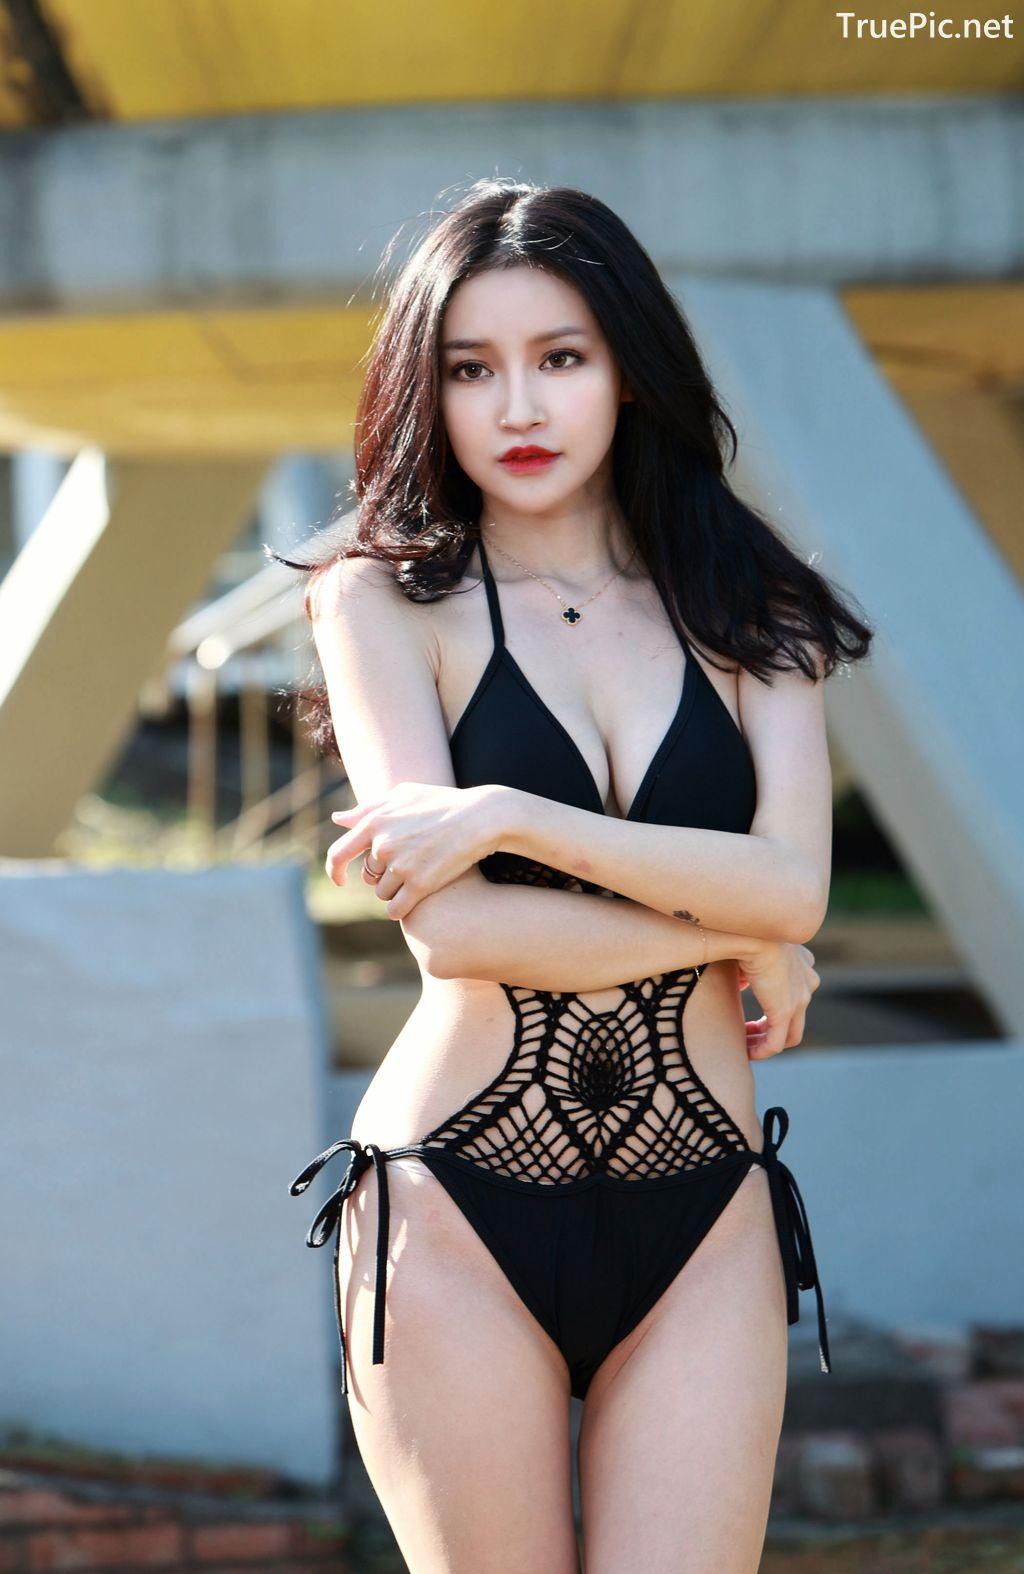 Image-Taiwanese-Model-艾薉-Long-Legs-And-Lovely-Bikini-Girl-TruePic.net- Picture-3